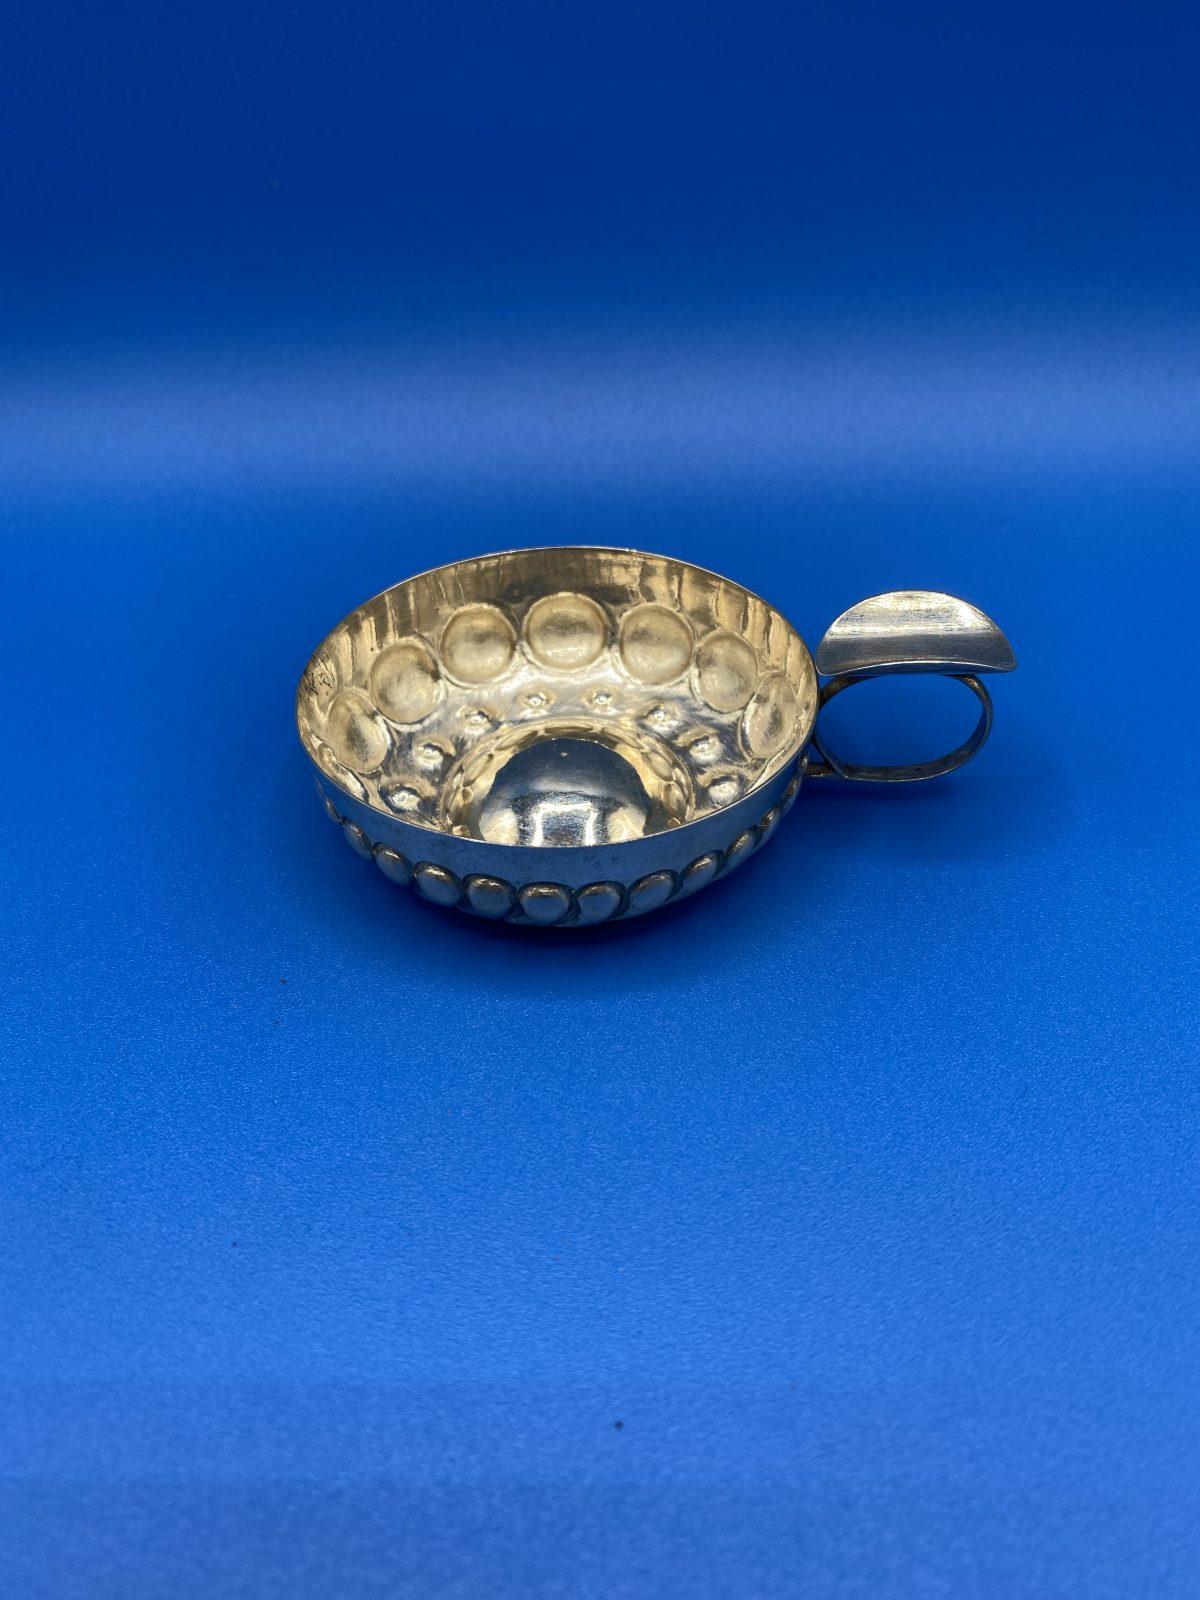 G3 - A Small Silver Tastevin, continental 800 grade silver.  £48